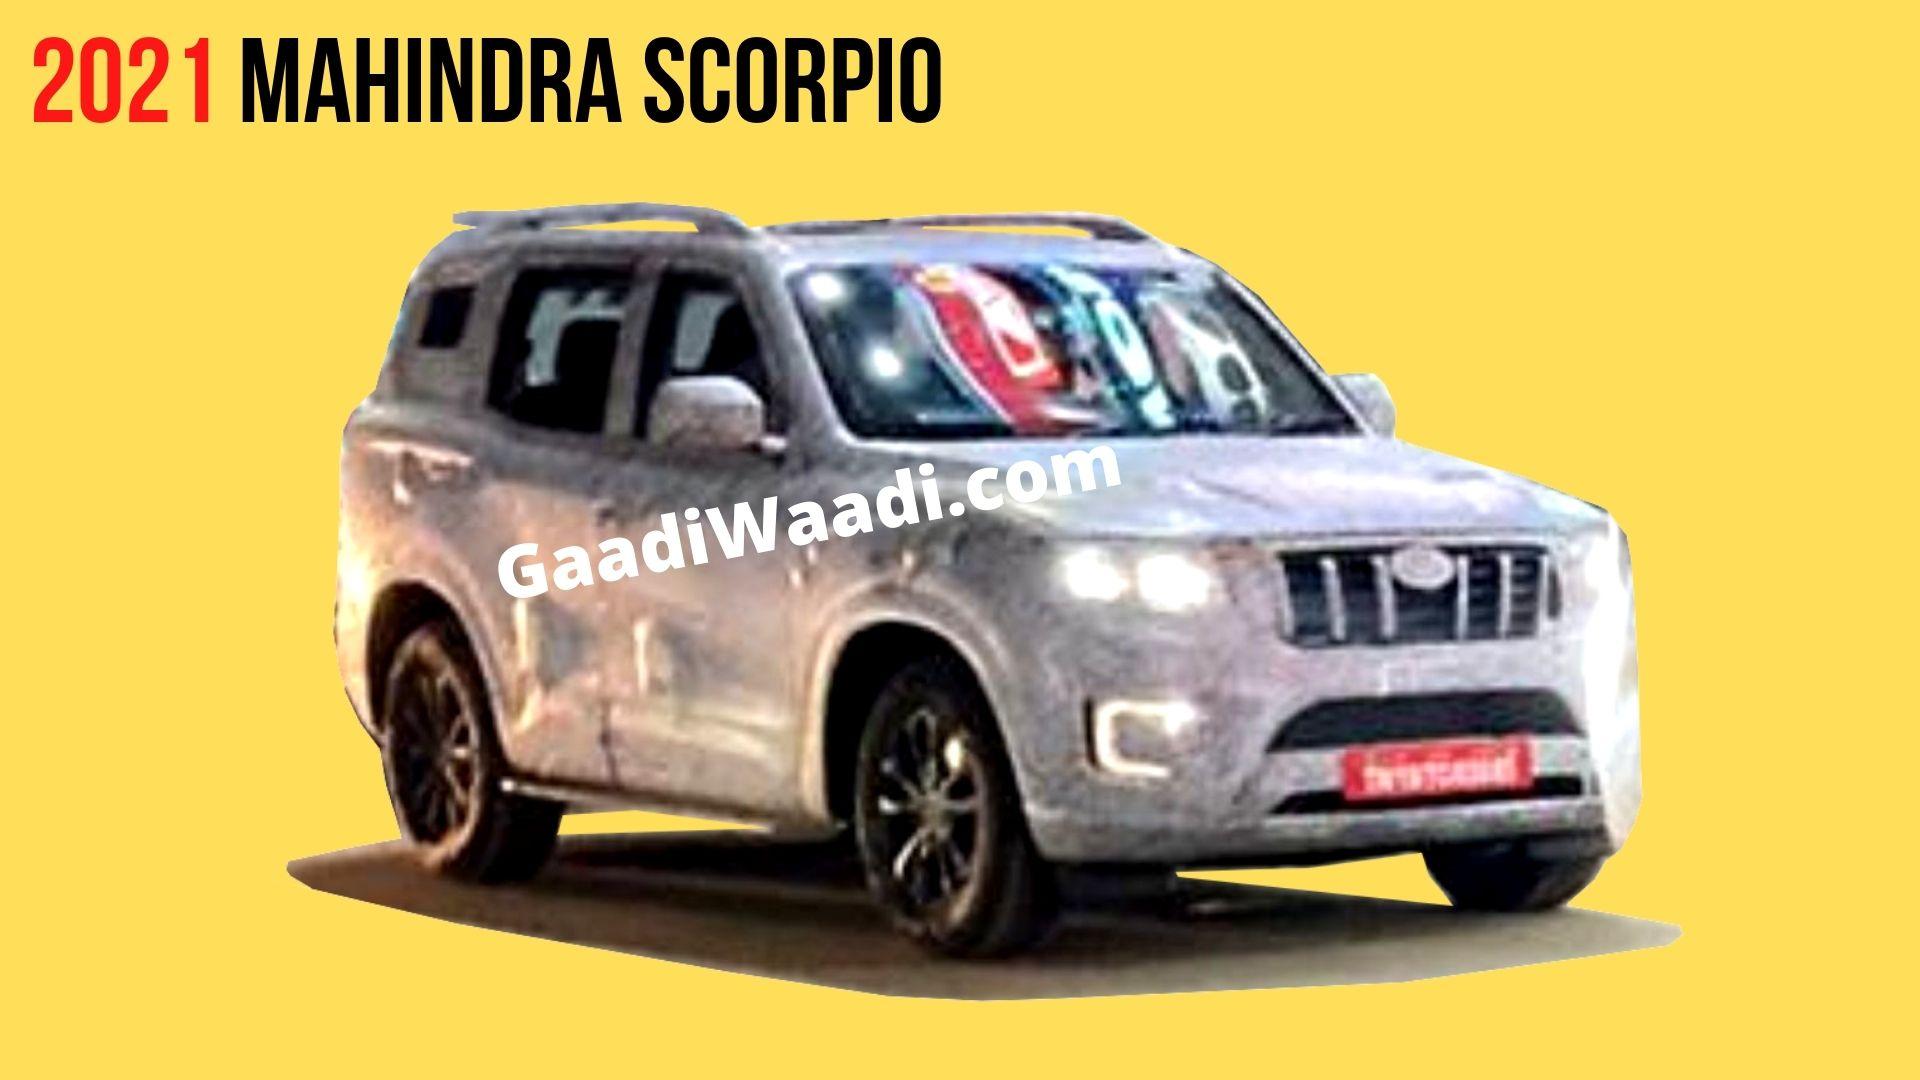 Mahindra Scorpio Next-Gen Alloy Wheel Design Revealed In New Spy Shots